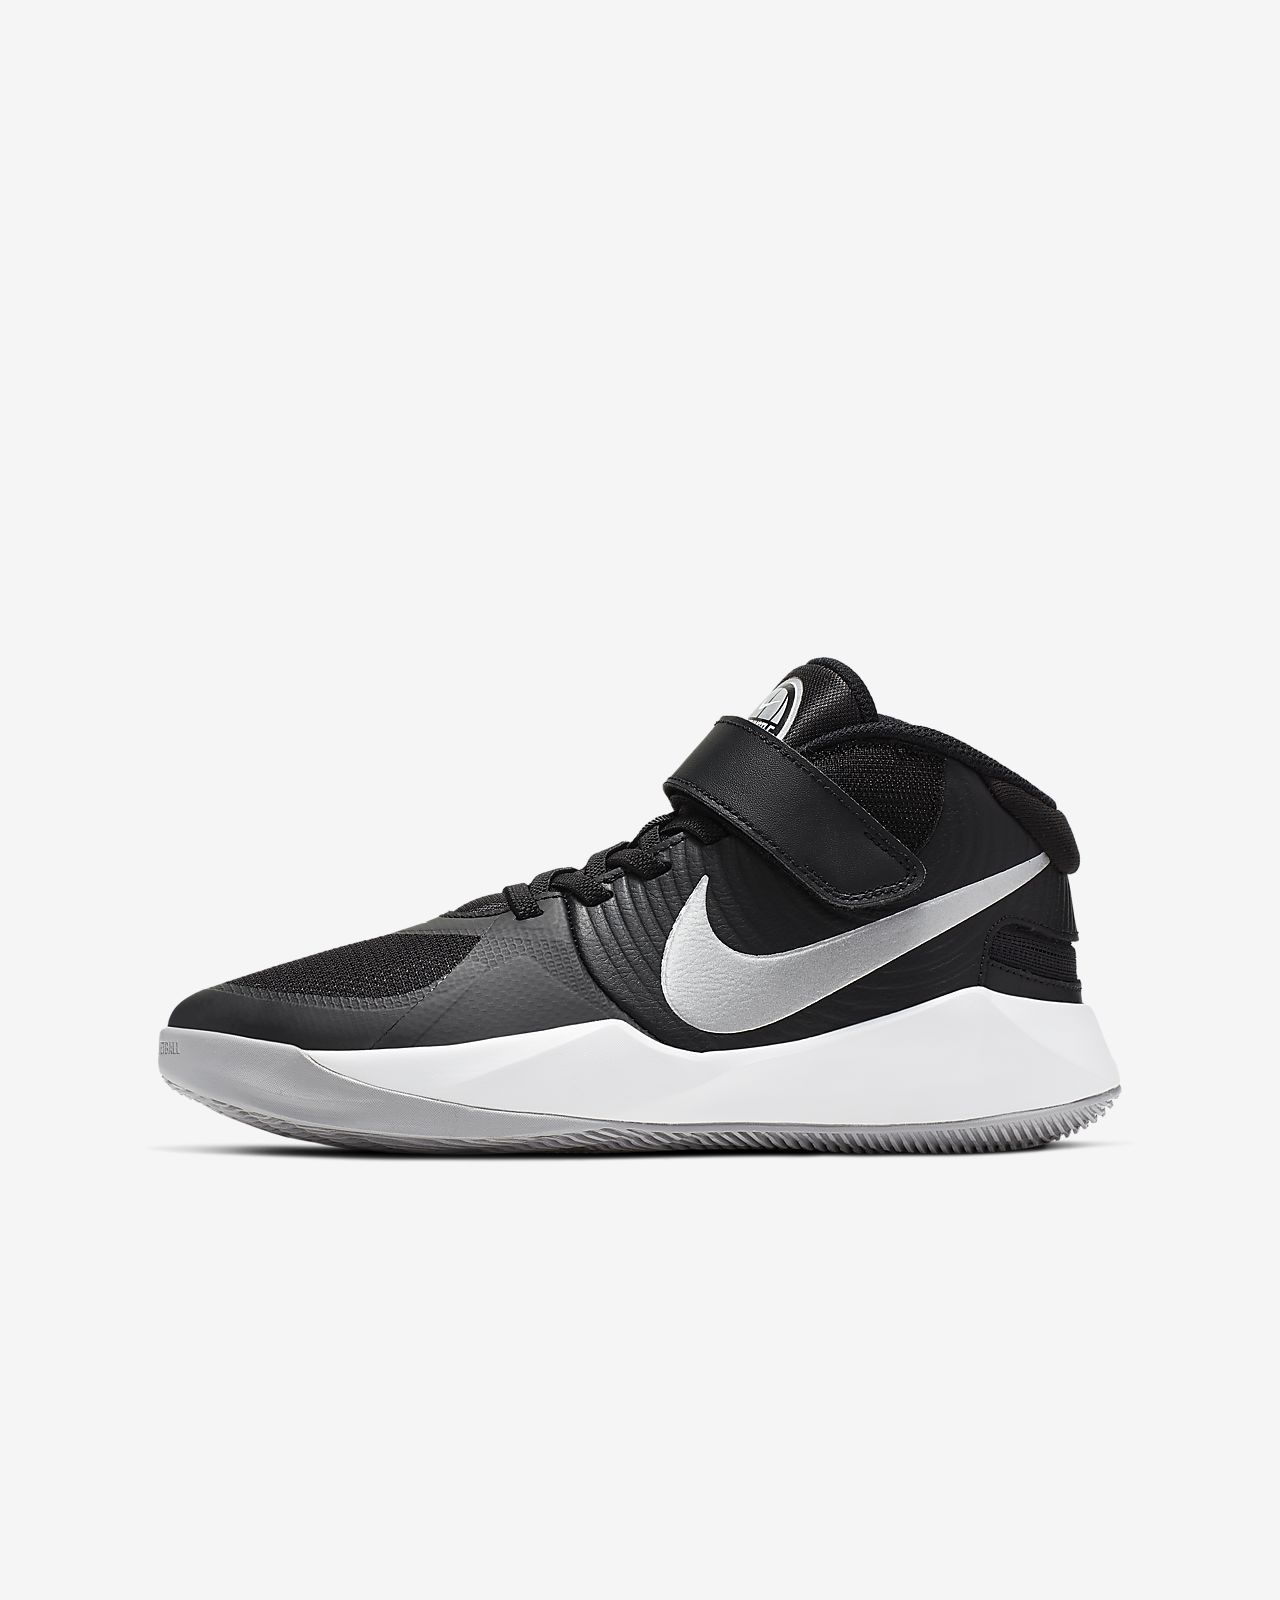 Sapatilhas de basquetebol Nike Team Hustle D 9 Flyease Júnior